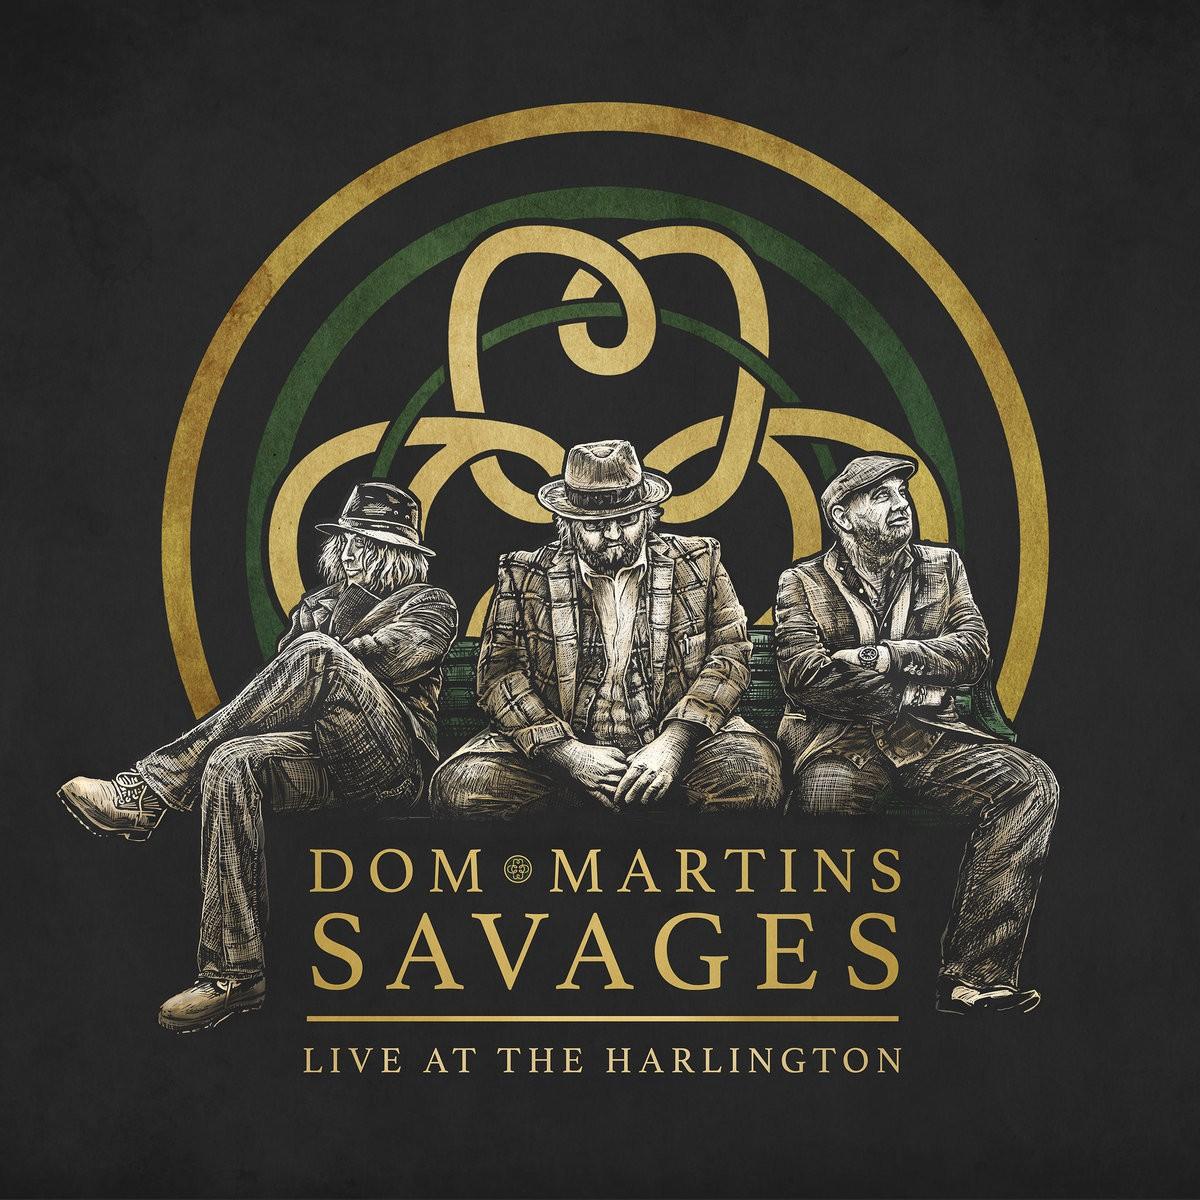 Dom Martins Savages - Live At The Harlington